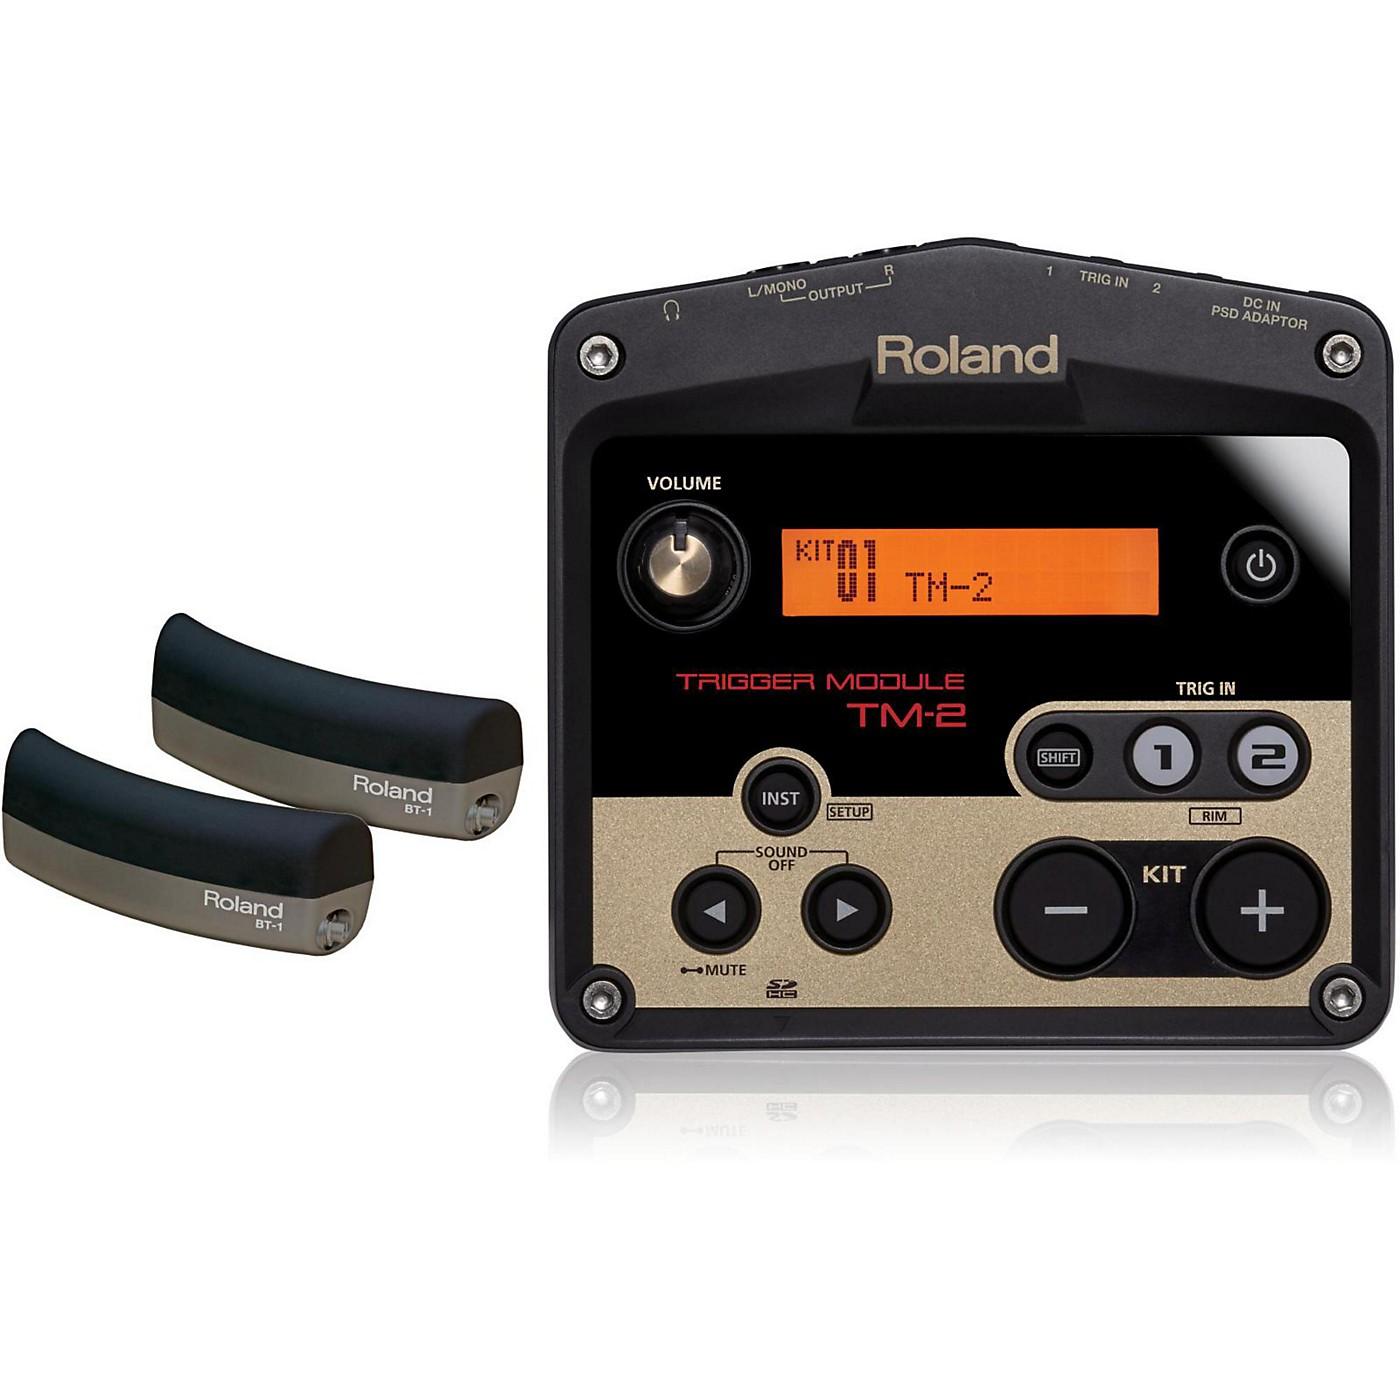 Roland TM-2 Drum Trigger module with 2 BT-1 Bar Trigger pads thumbnail